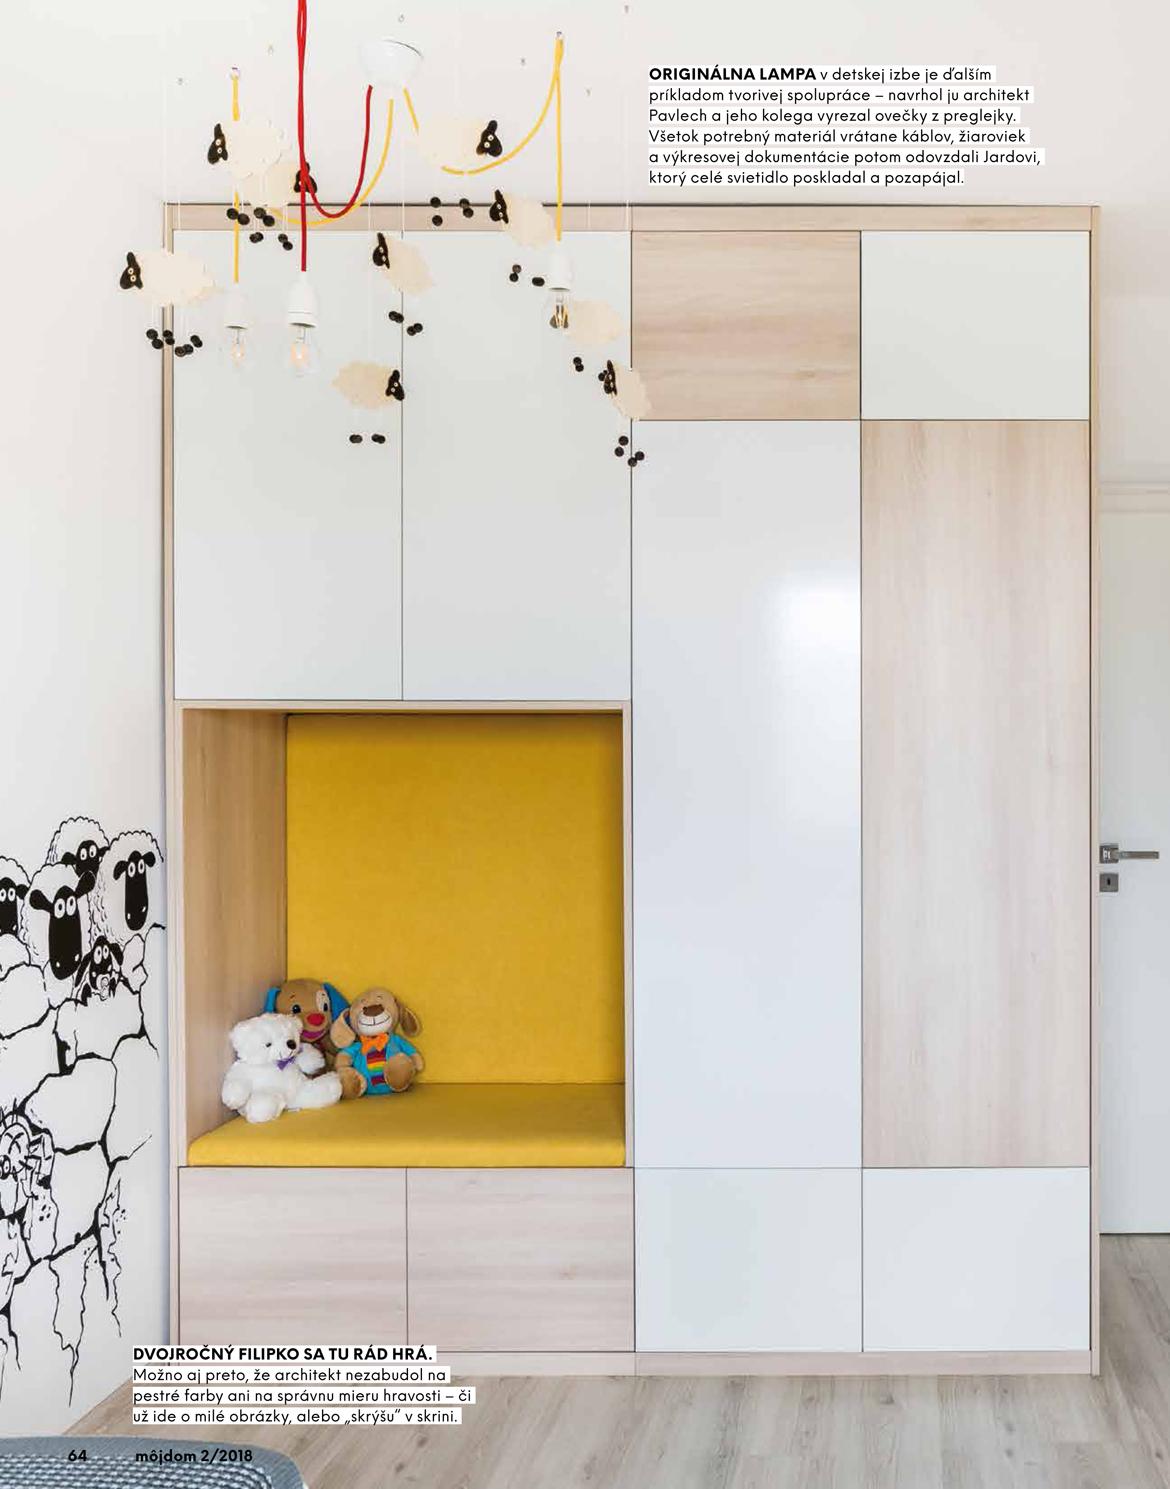 010-byt-cachtice-rekonstrukcia-interier-mojdom-pavlech-architekti